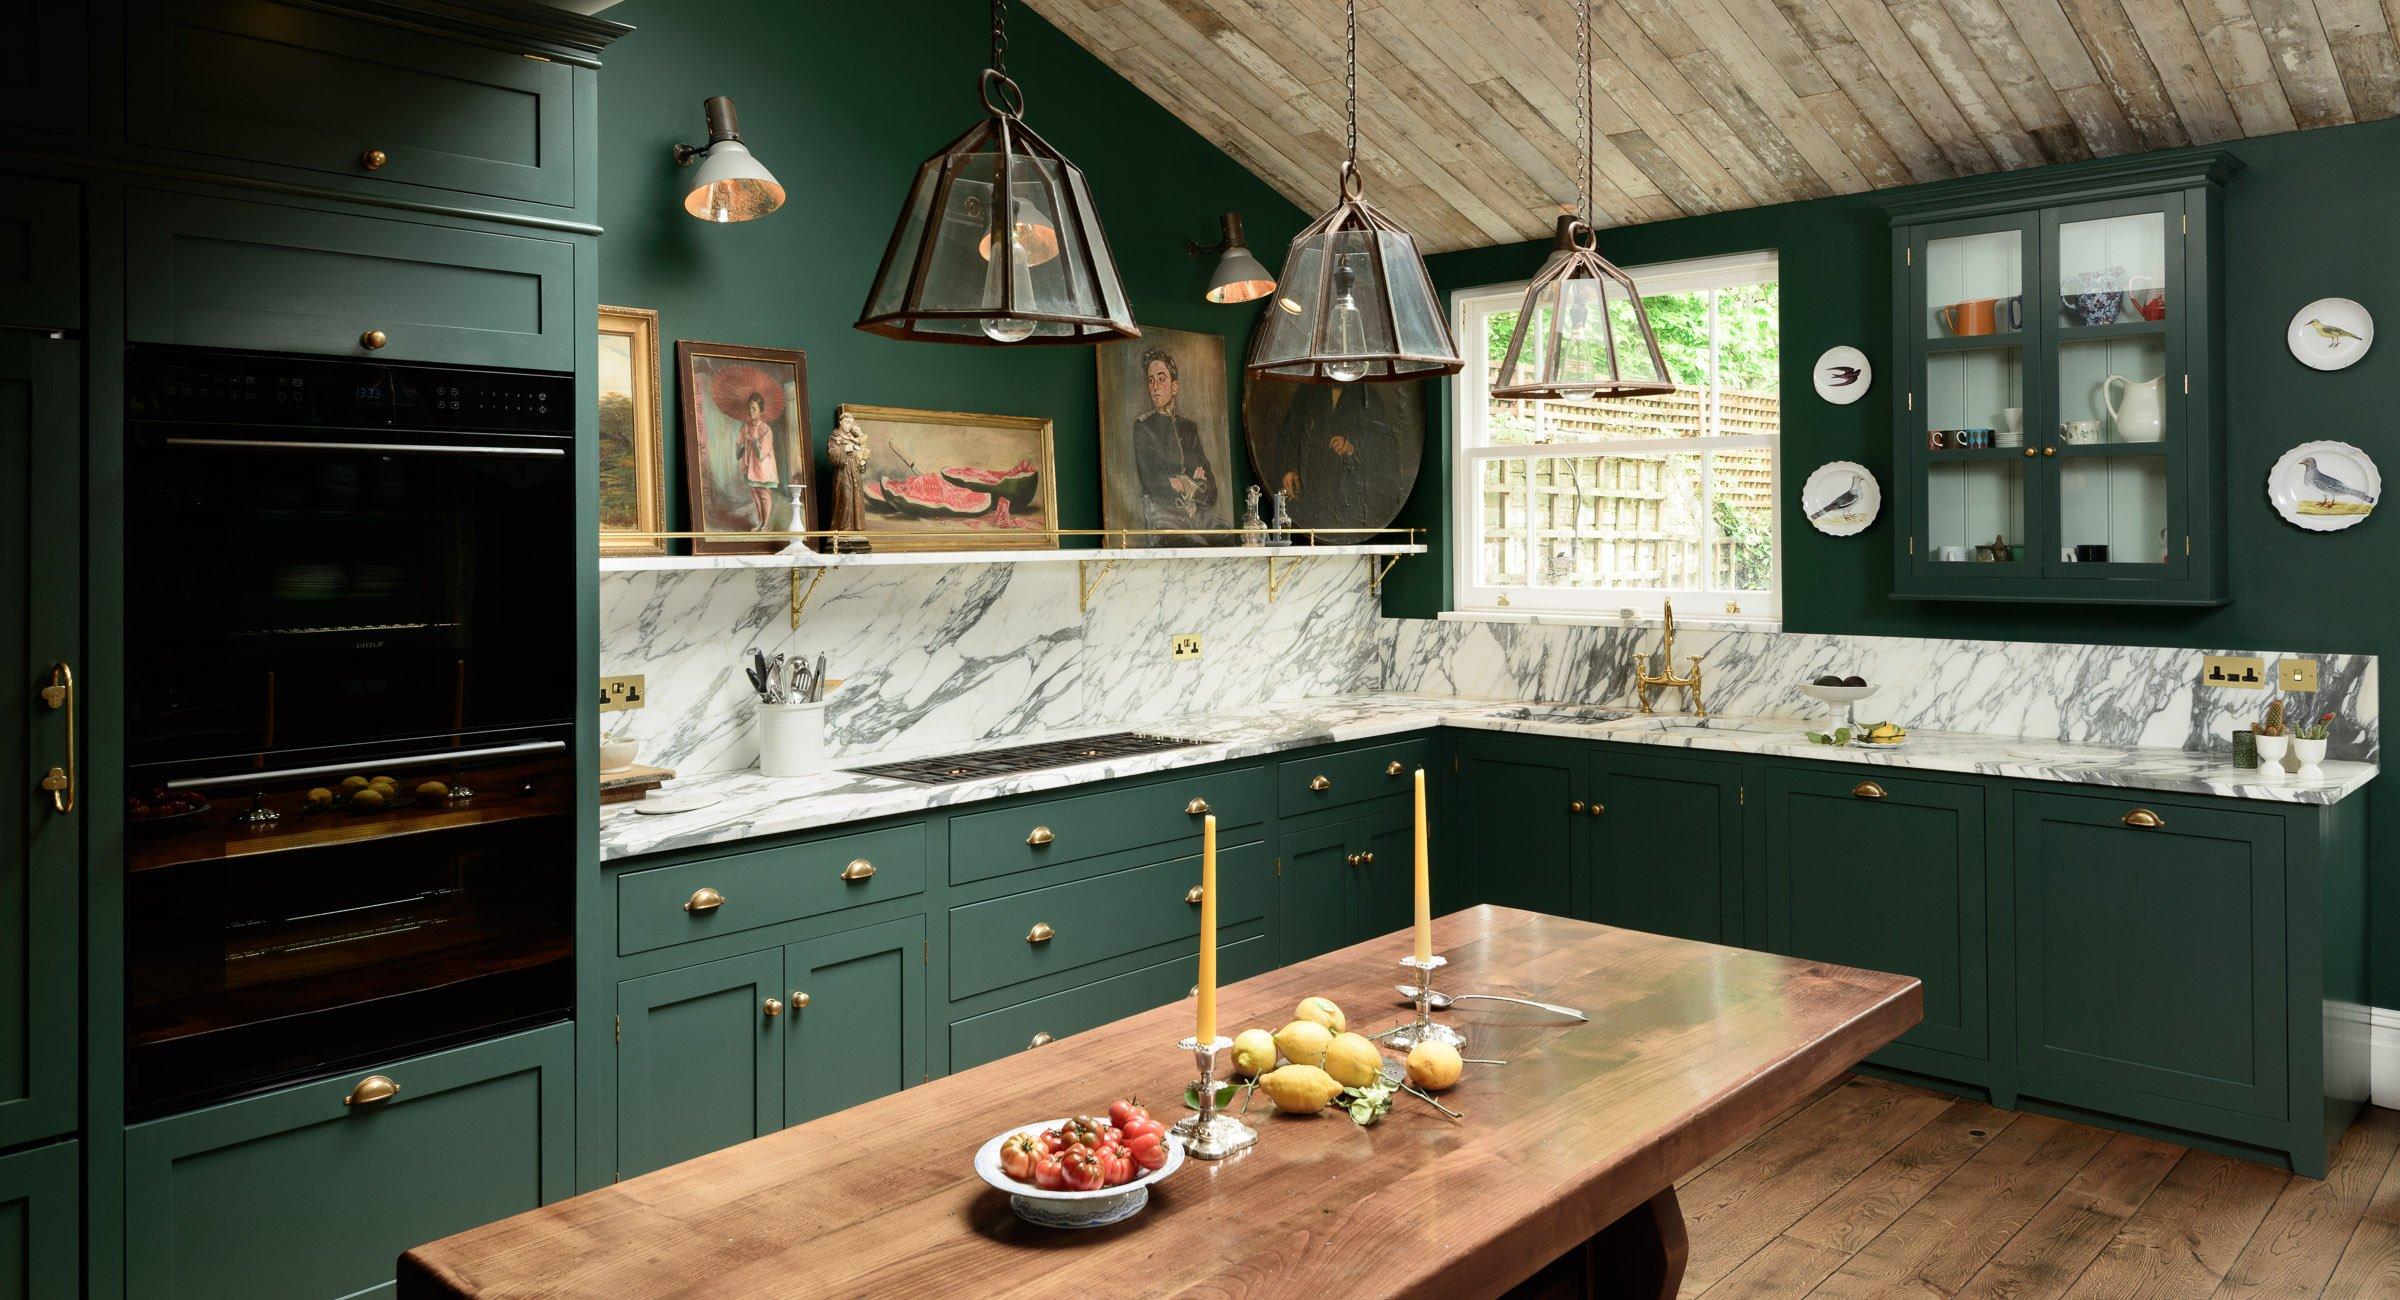 devol_peckham-rye-kitchen-dsc_6848-edit